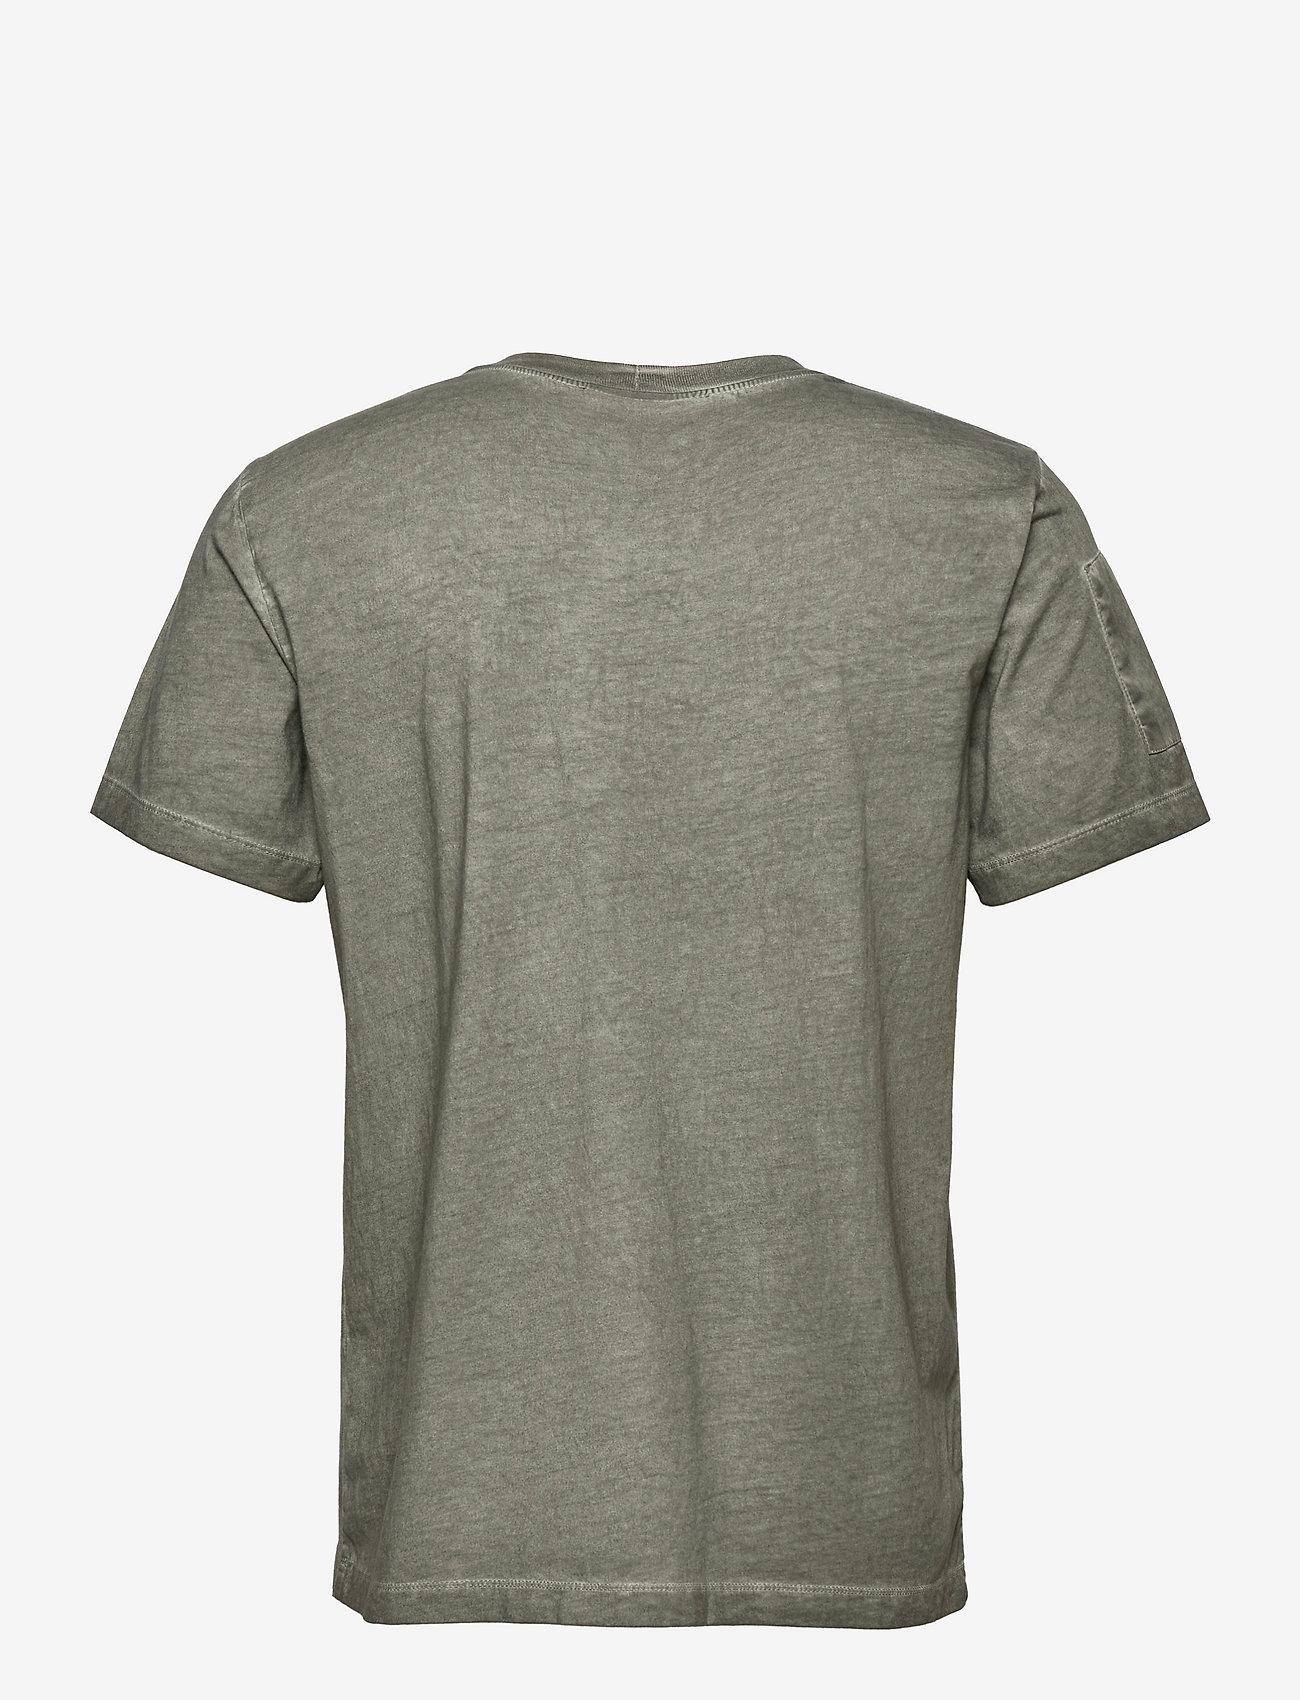 Helmut Lang - MILITARY TSHIRT.GARM - t-shirts basiques - alpine - 1